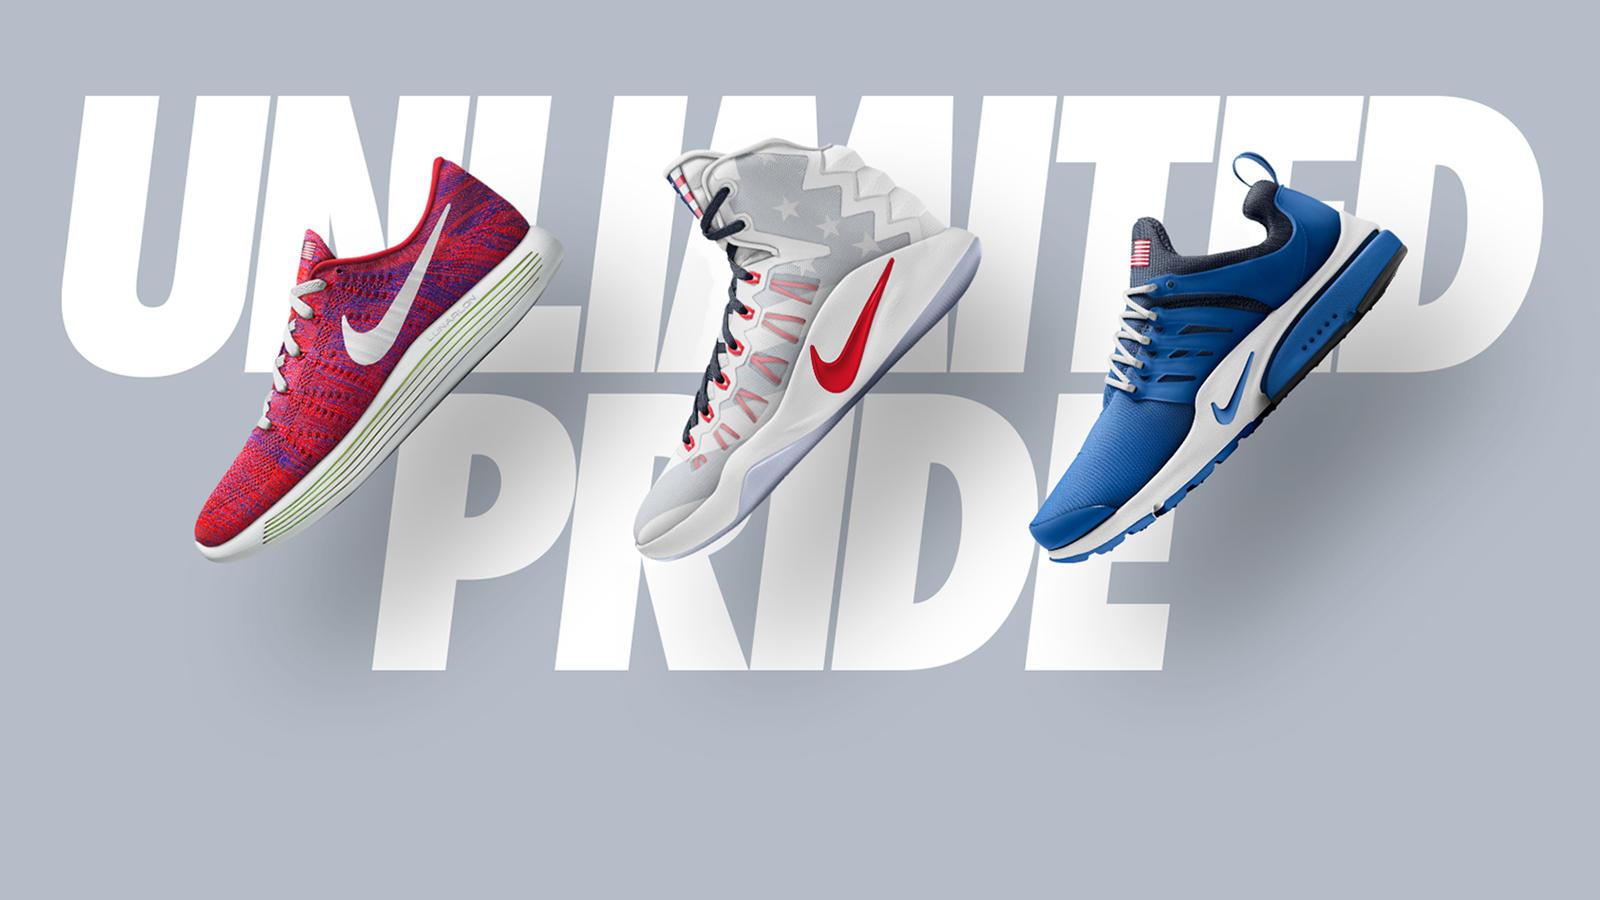 beb9081d8be9 Unlimited Pride. NIKEiD UnlimitedPride ...